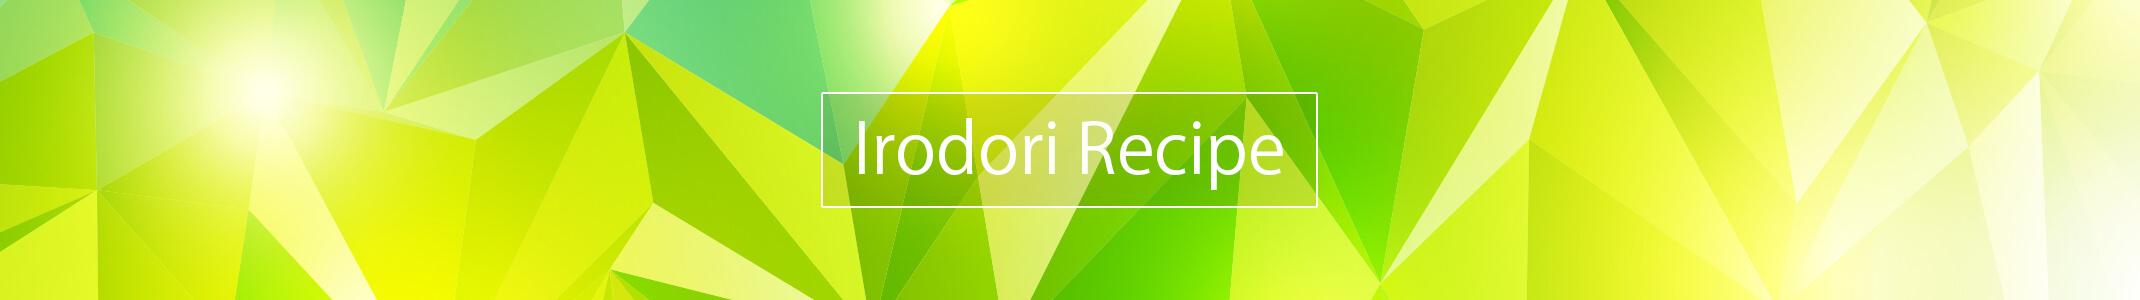 IrodoriRecipe イロドリレシピ